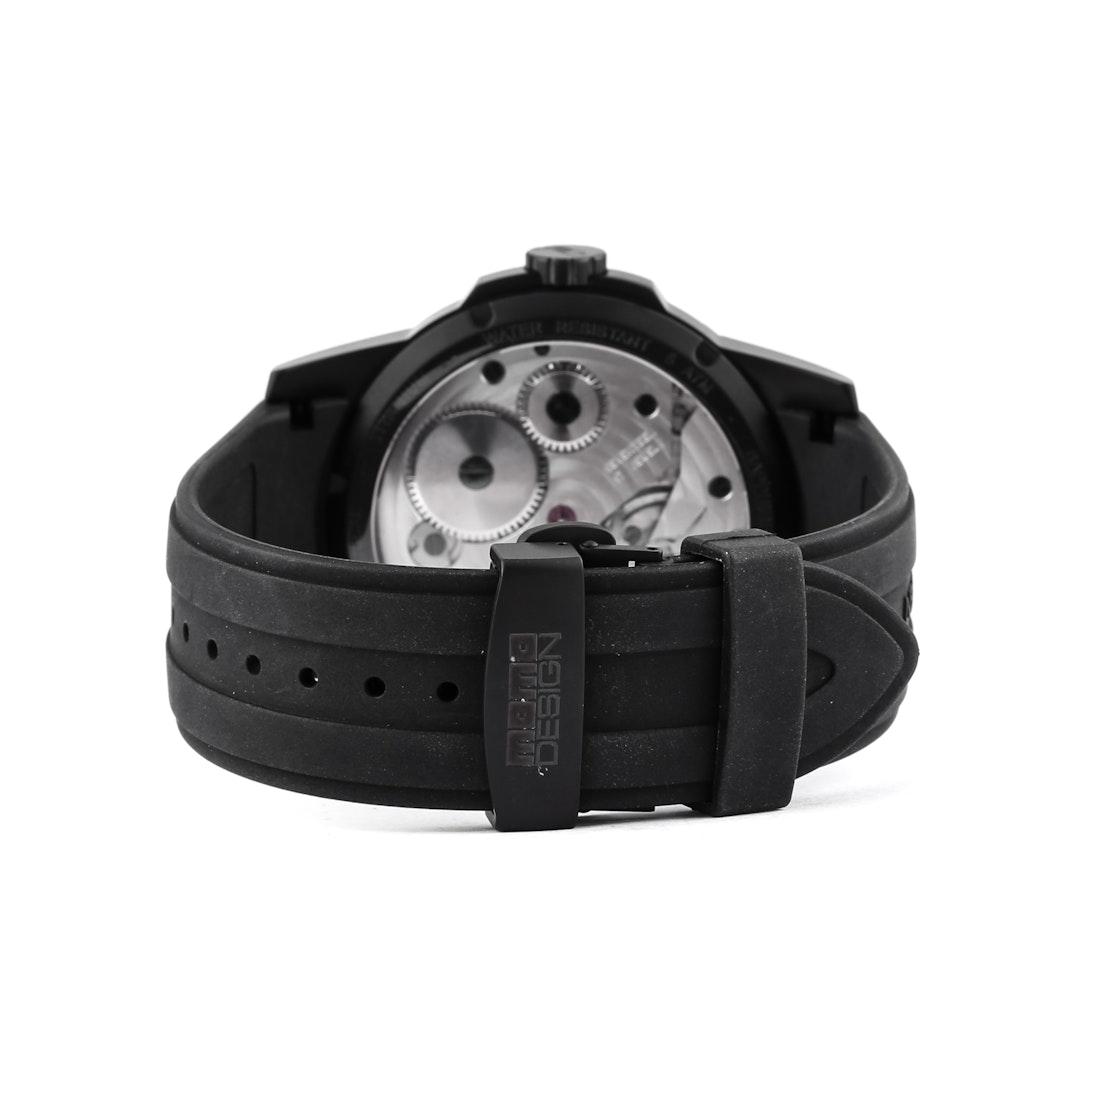 Momo Design Black Titanium Hand-Wound MD275-BK-RB-04BK